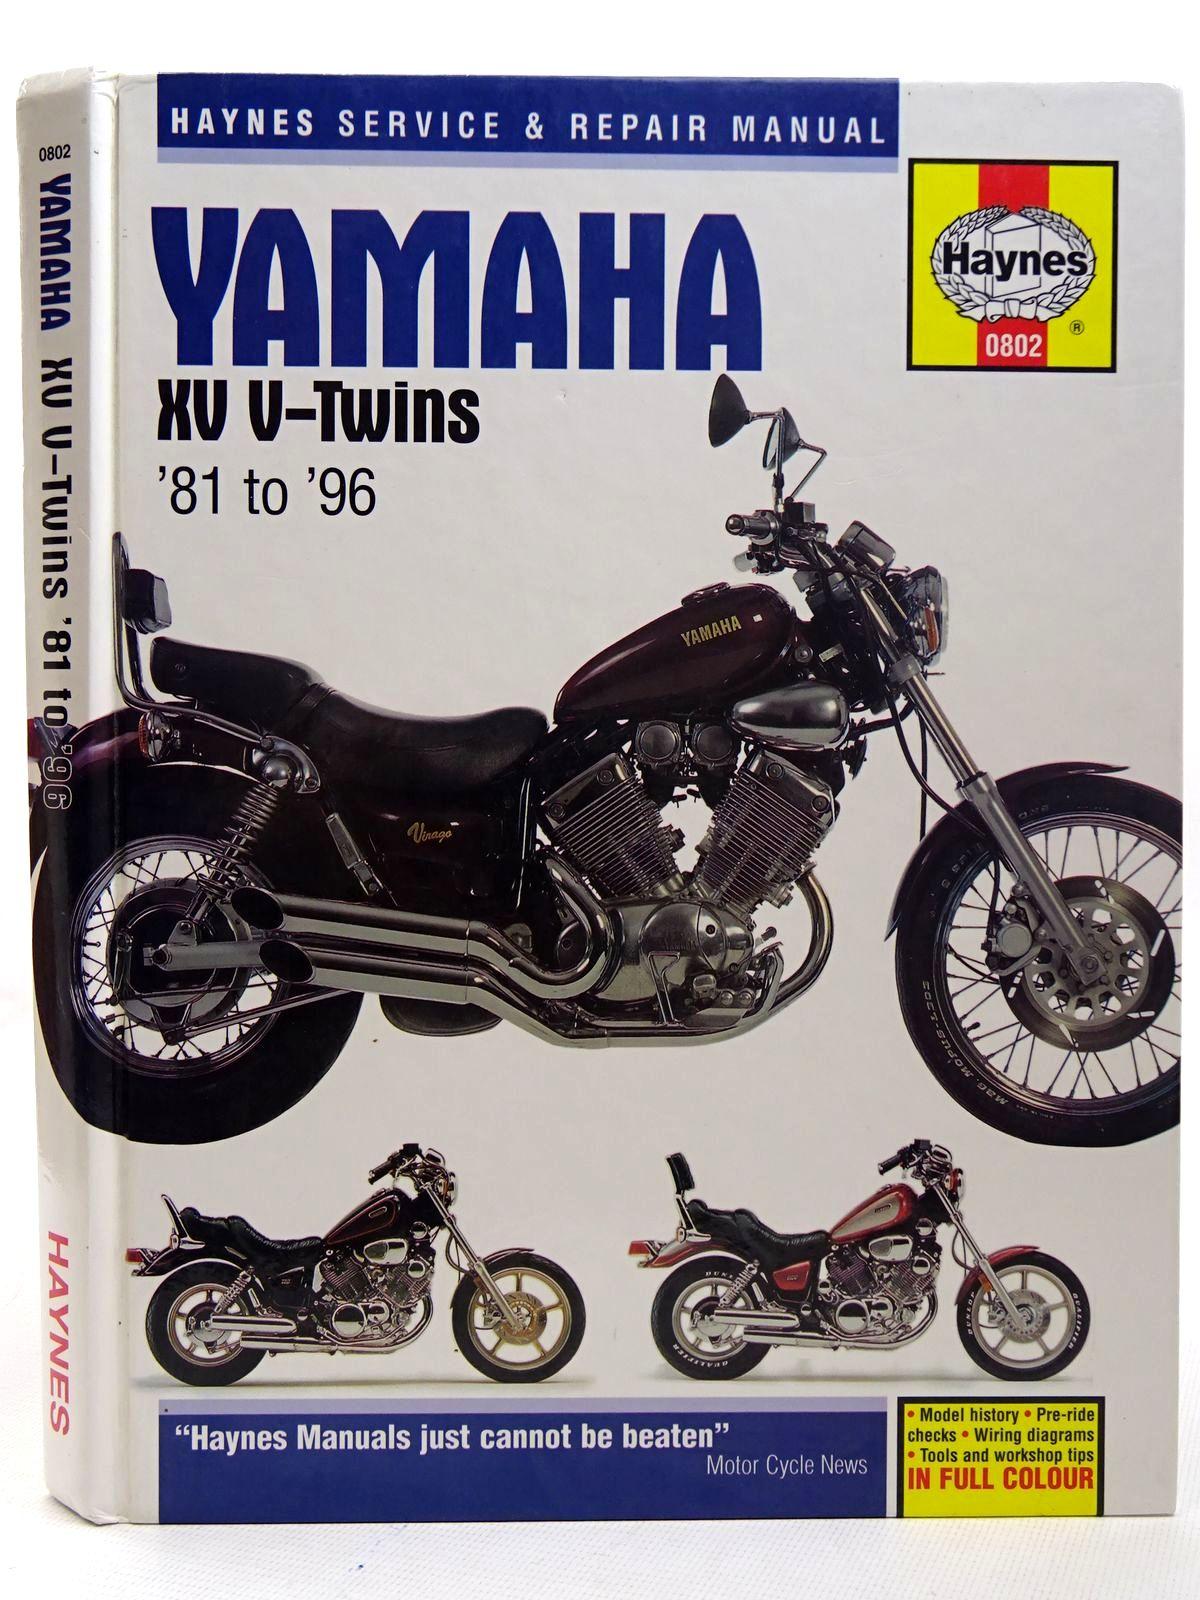 hight resolution of 12 00 photo of yamaha xv v twins service and repair manual